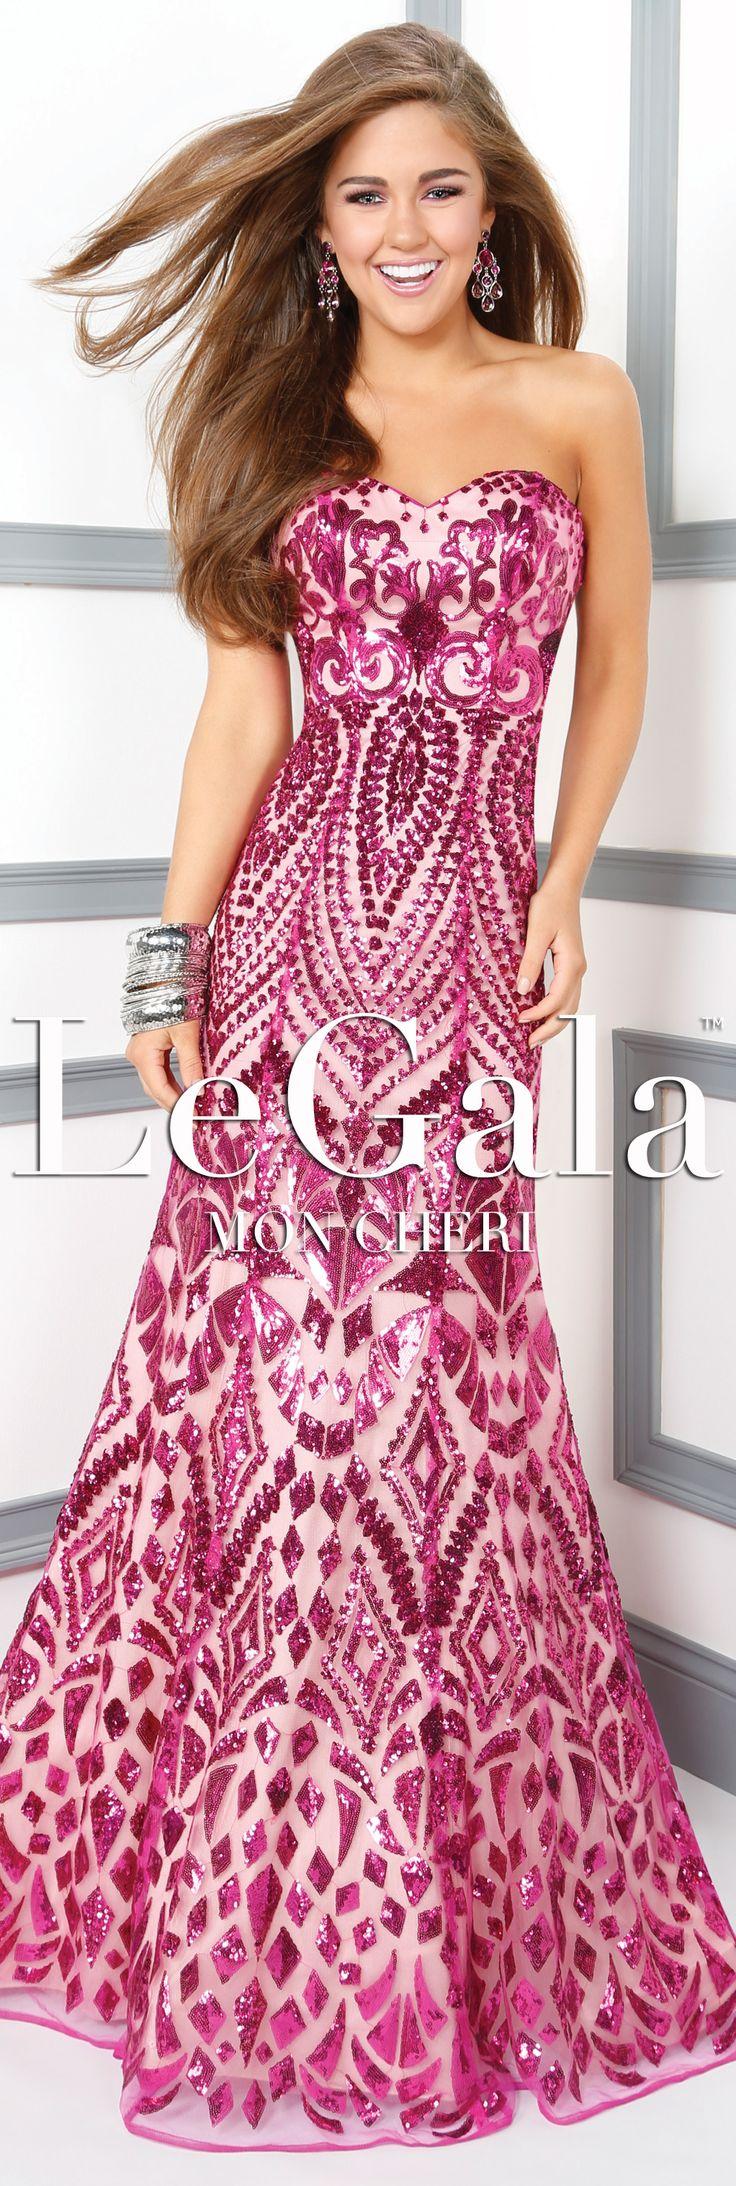 506 best pageant dresses. images on Pinterest | Long prom dresses ...